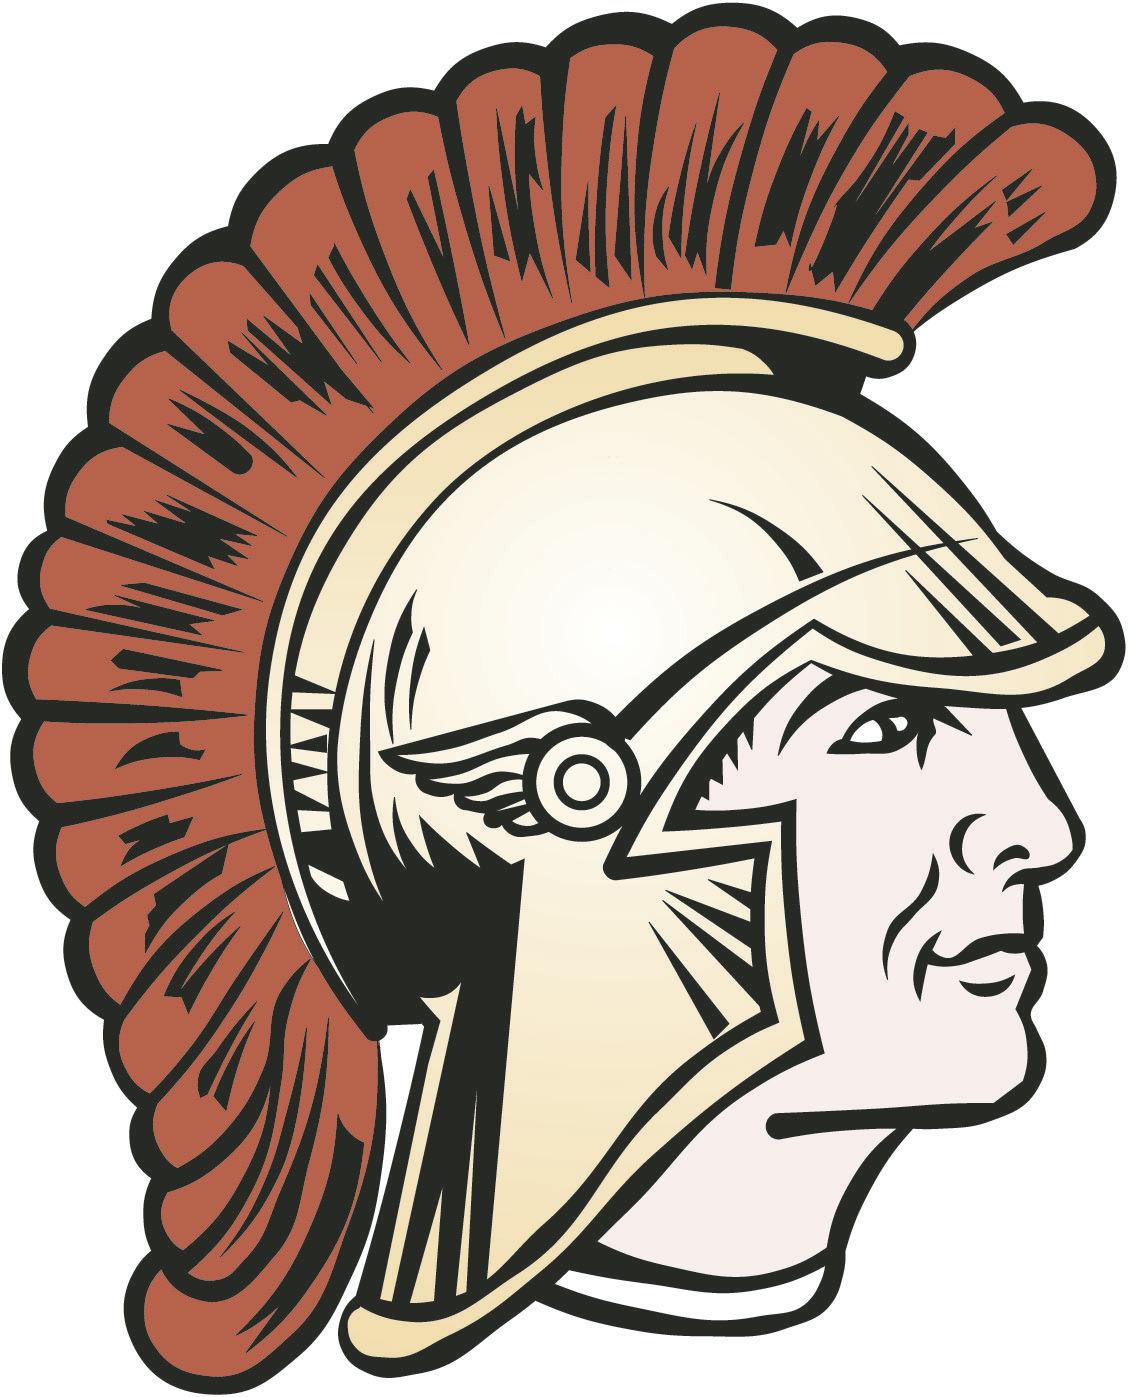 Osawatomie Trojan logo